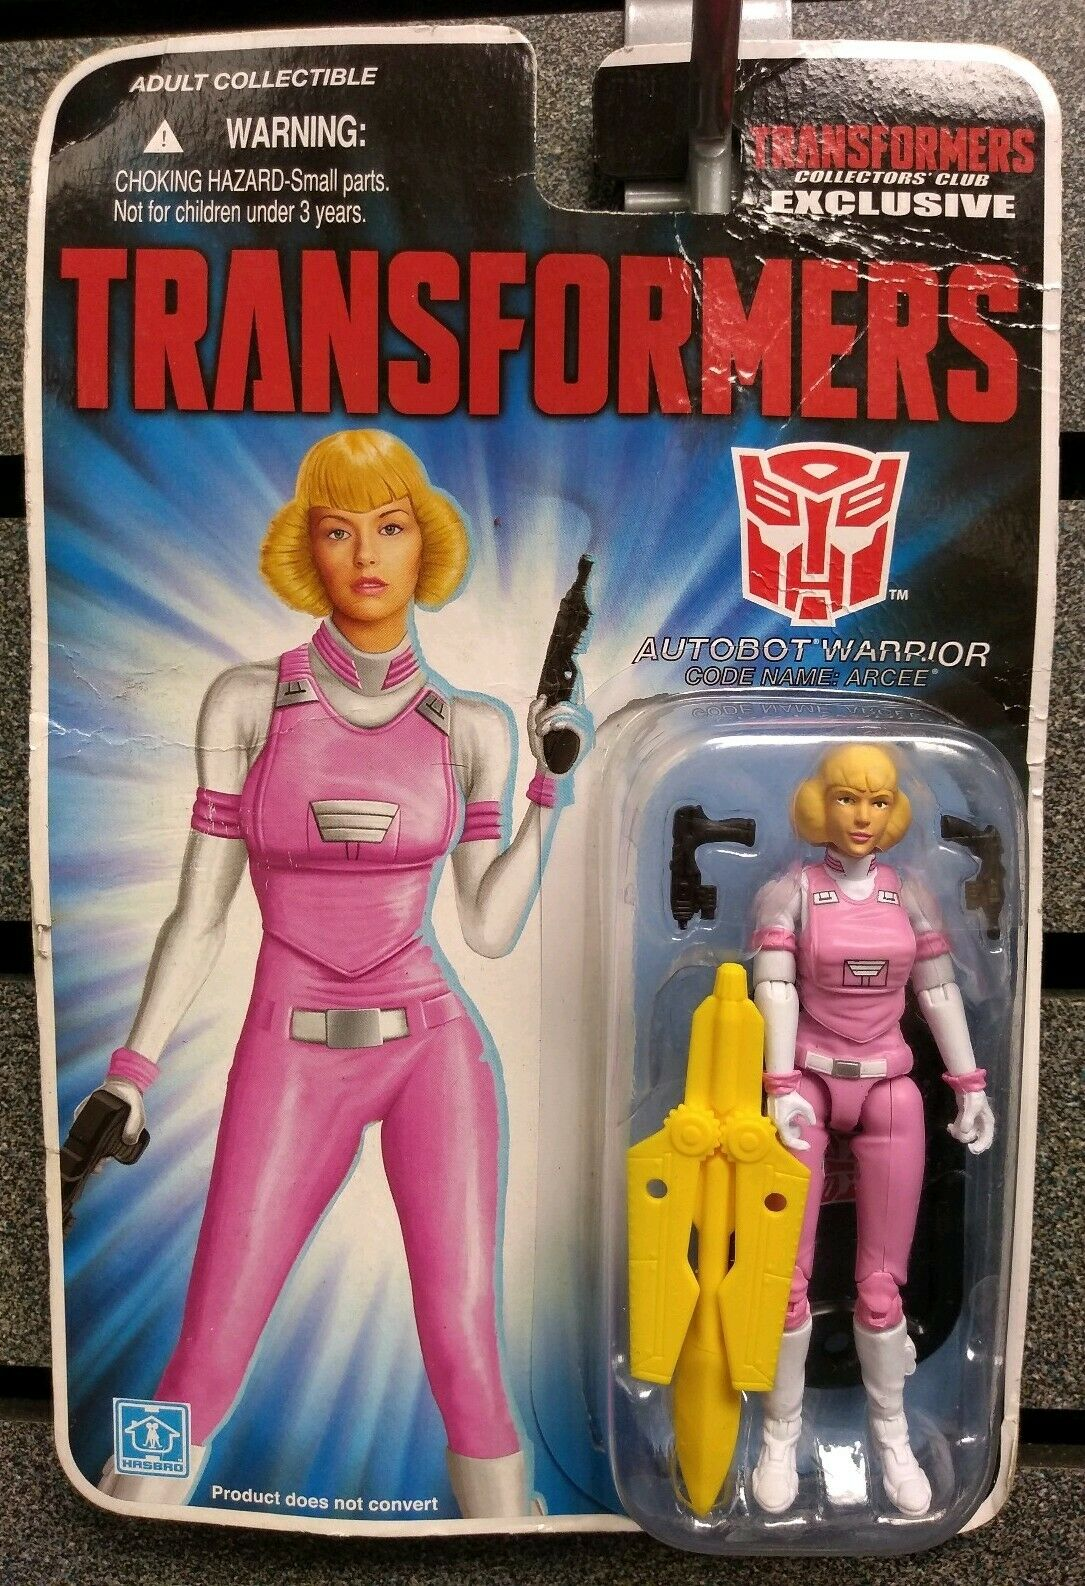 Transformers   Collectors Club Exclusive   Autobot Warrior   Arcee   NEW